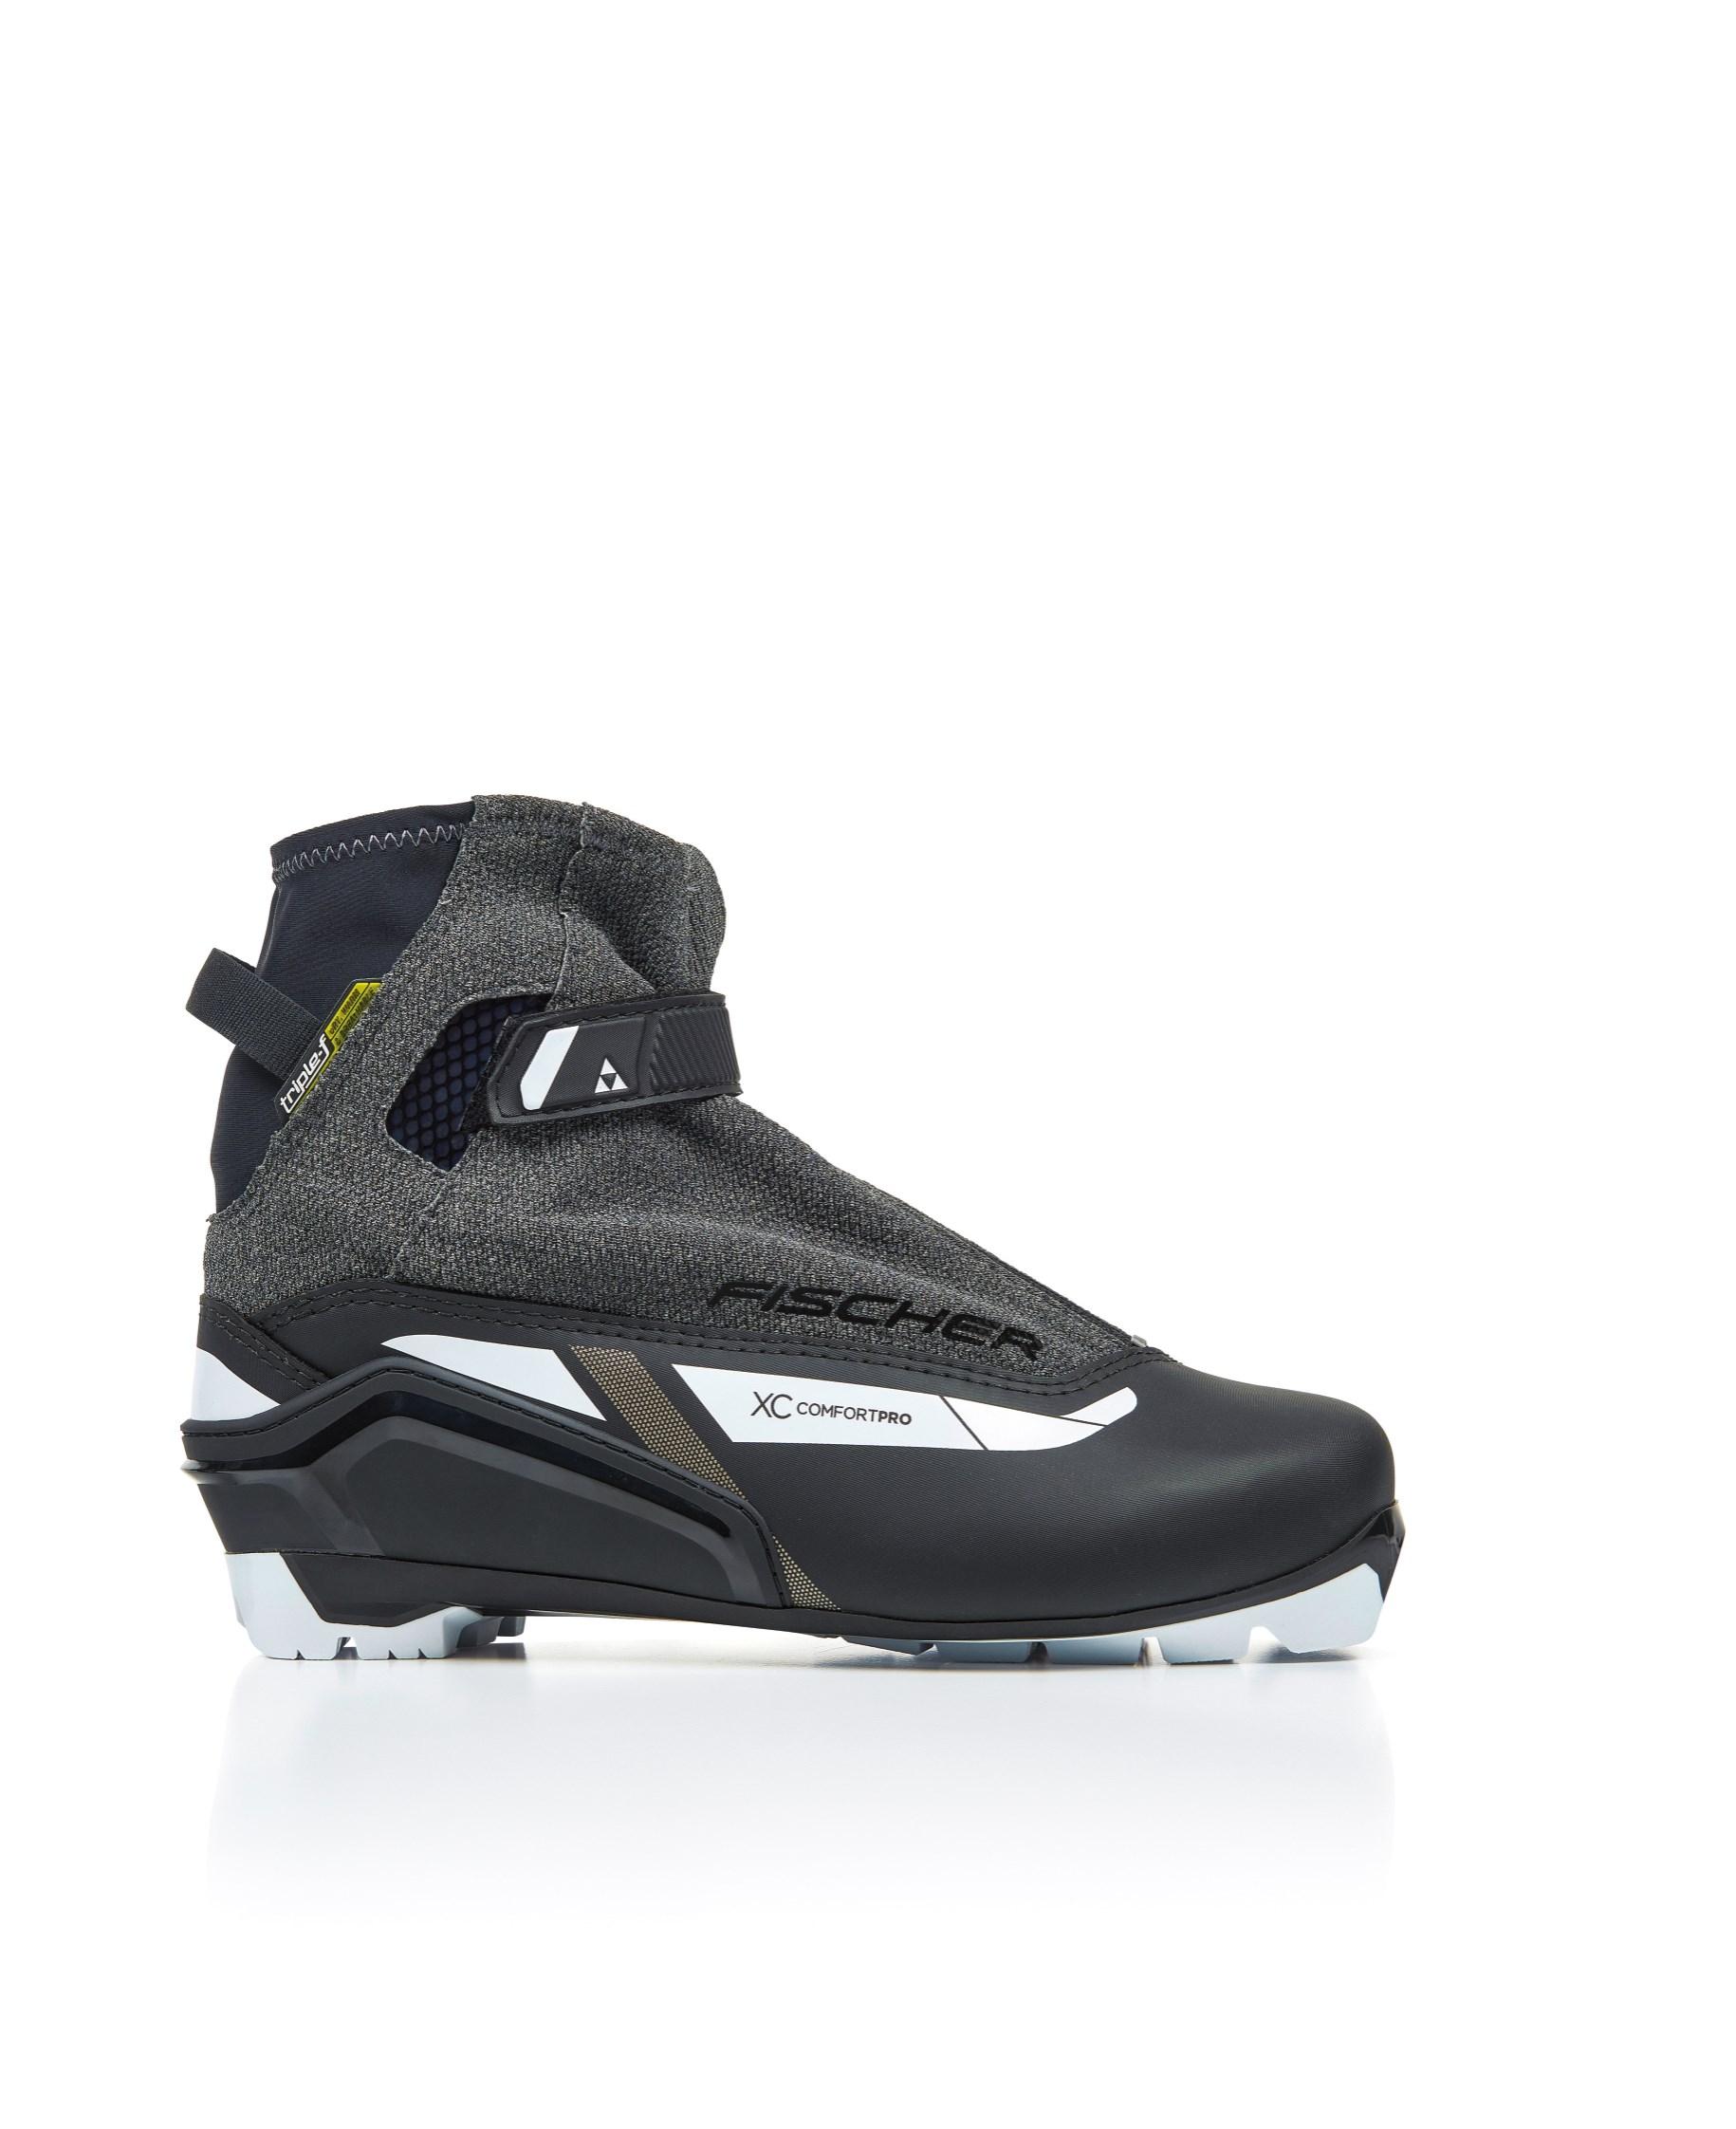 Fischer Langlaufschuh XC Comfort Pro WS